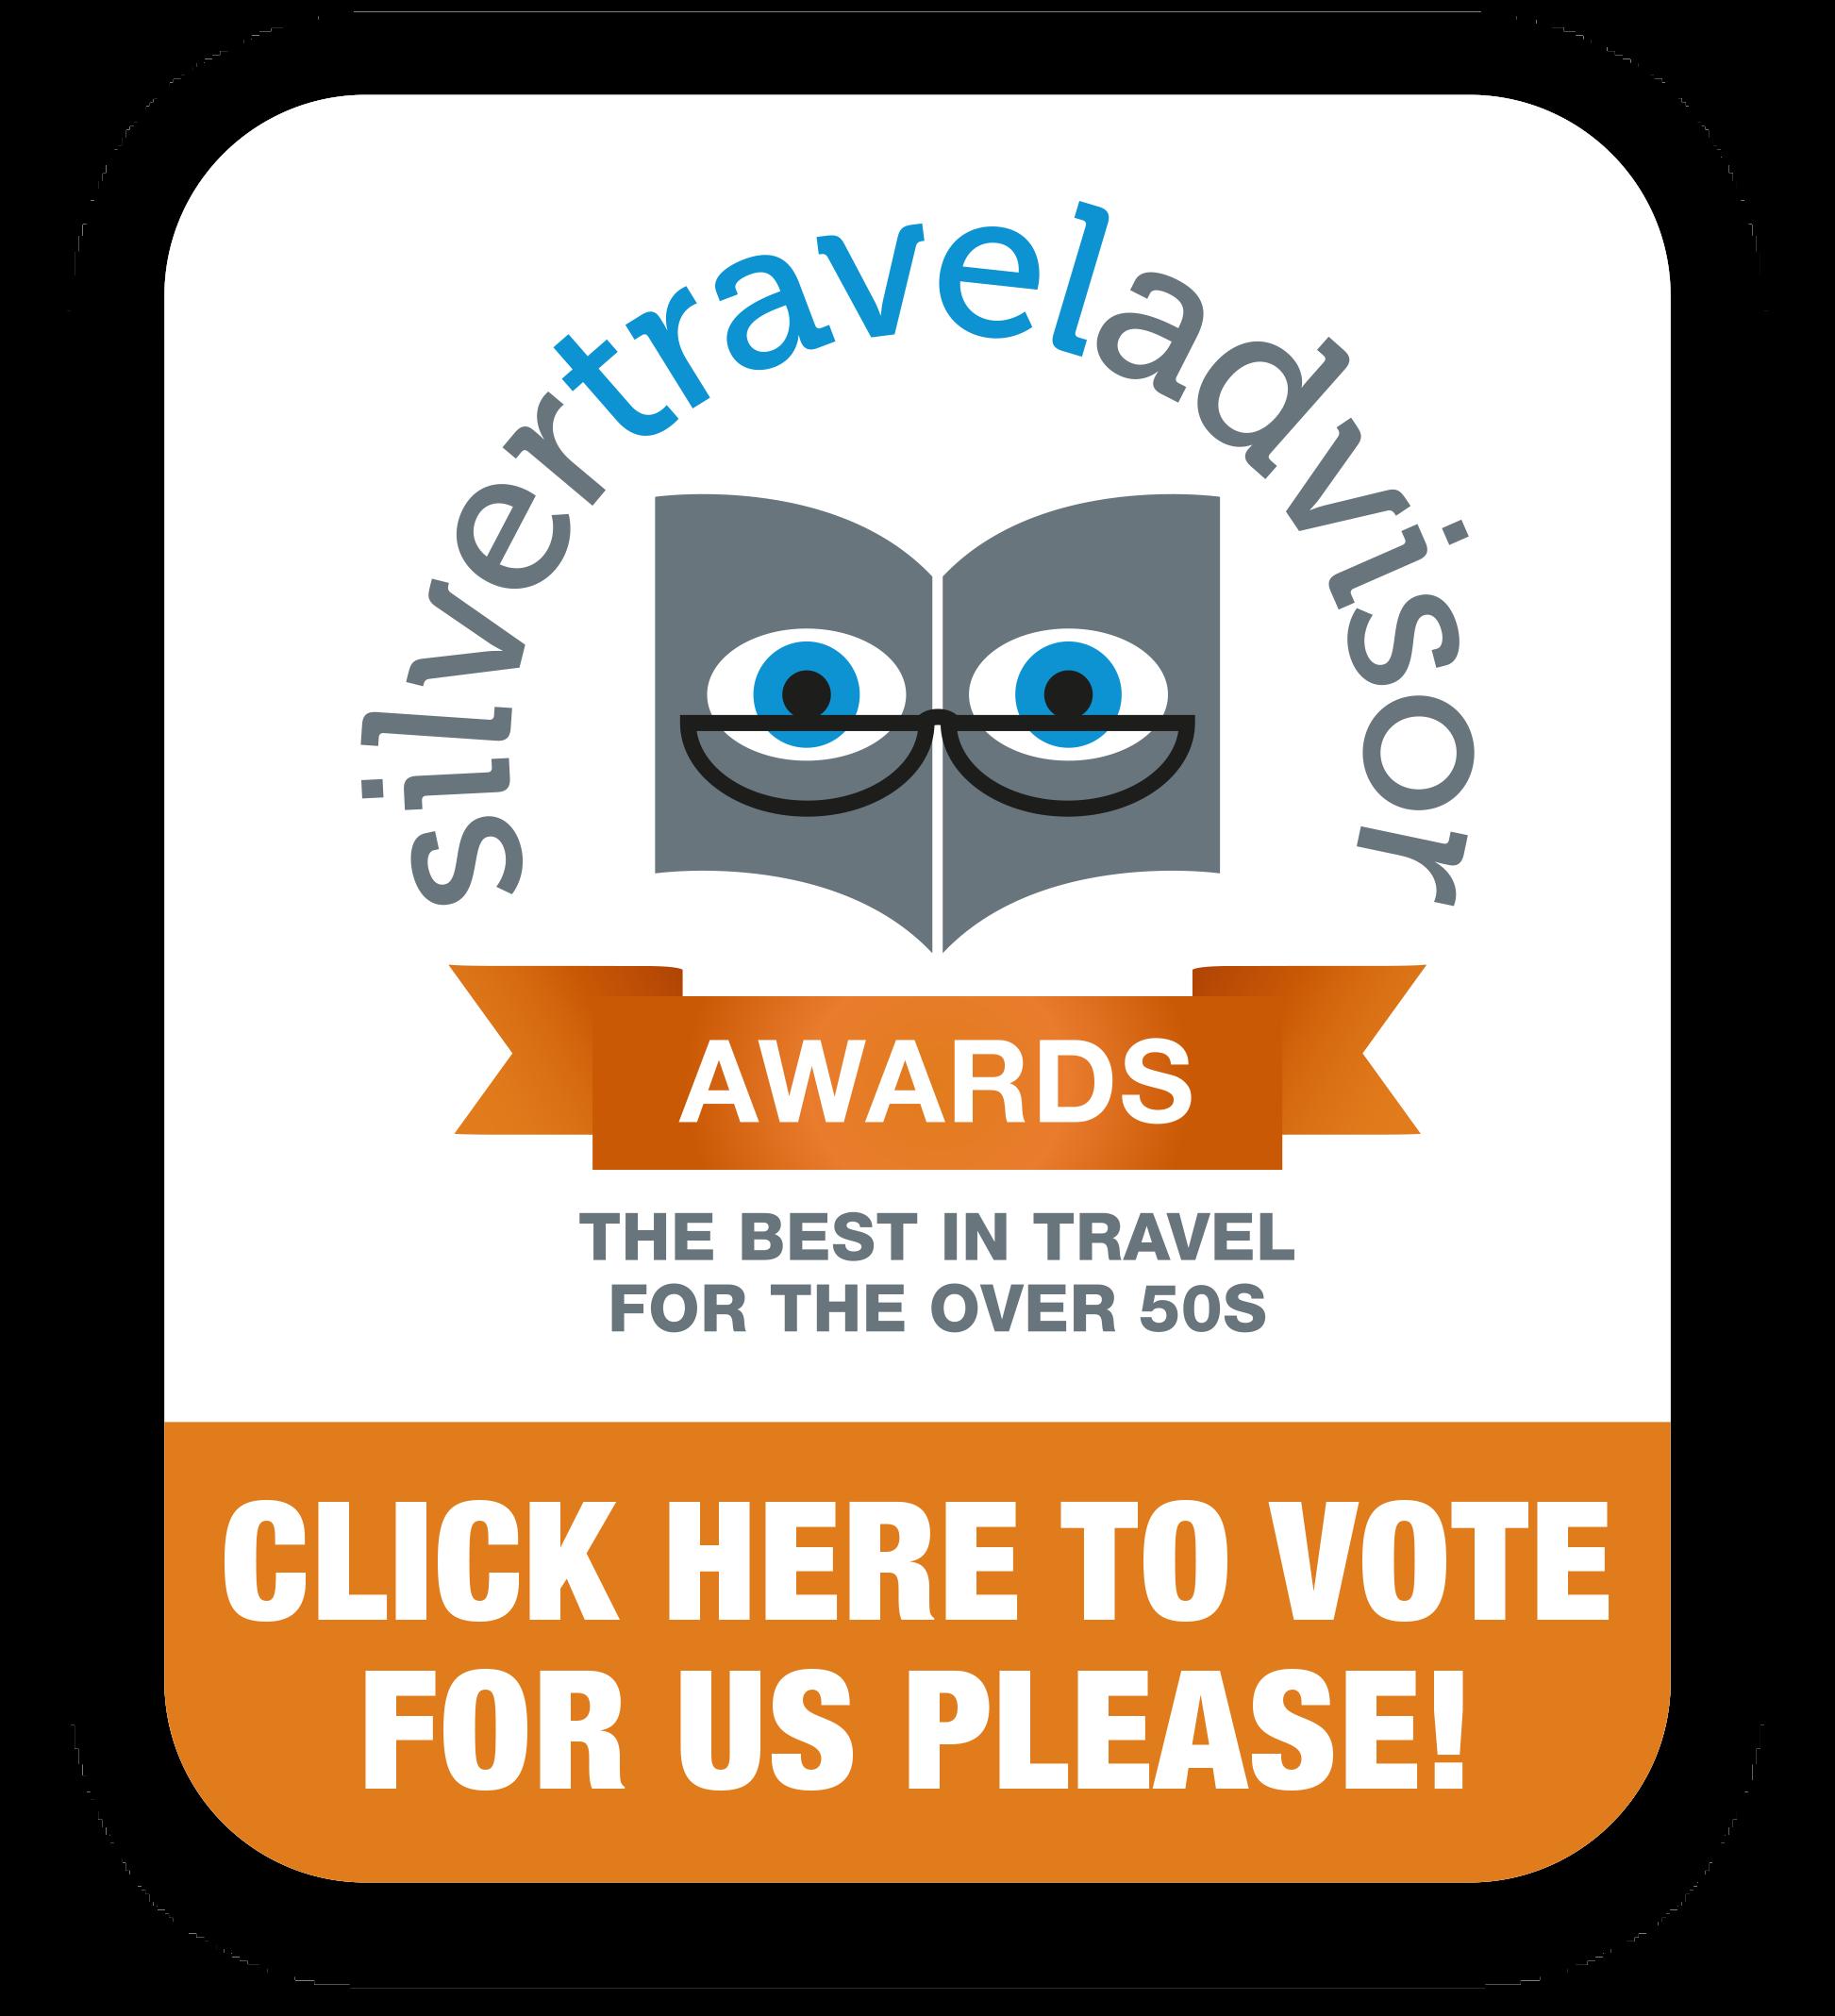 Silver Travel Awards